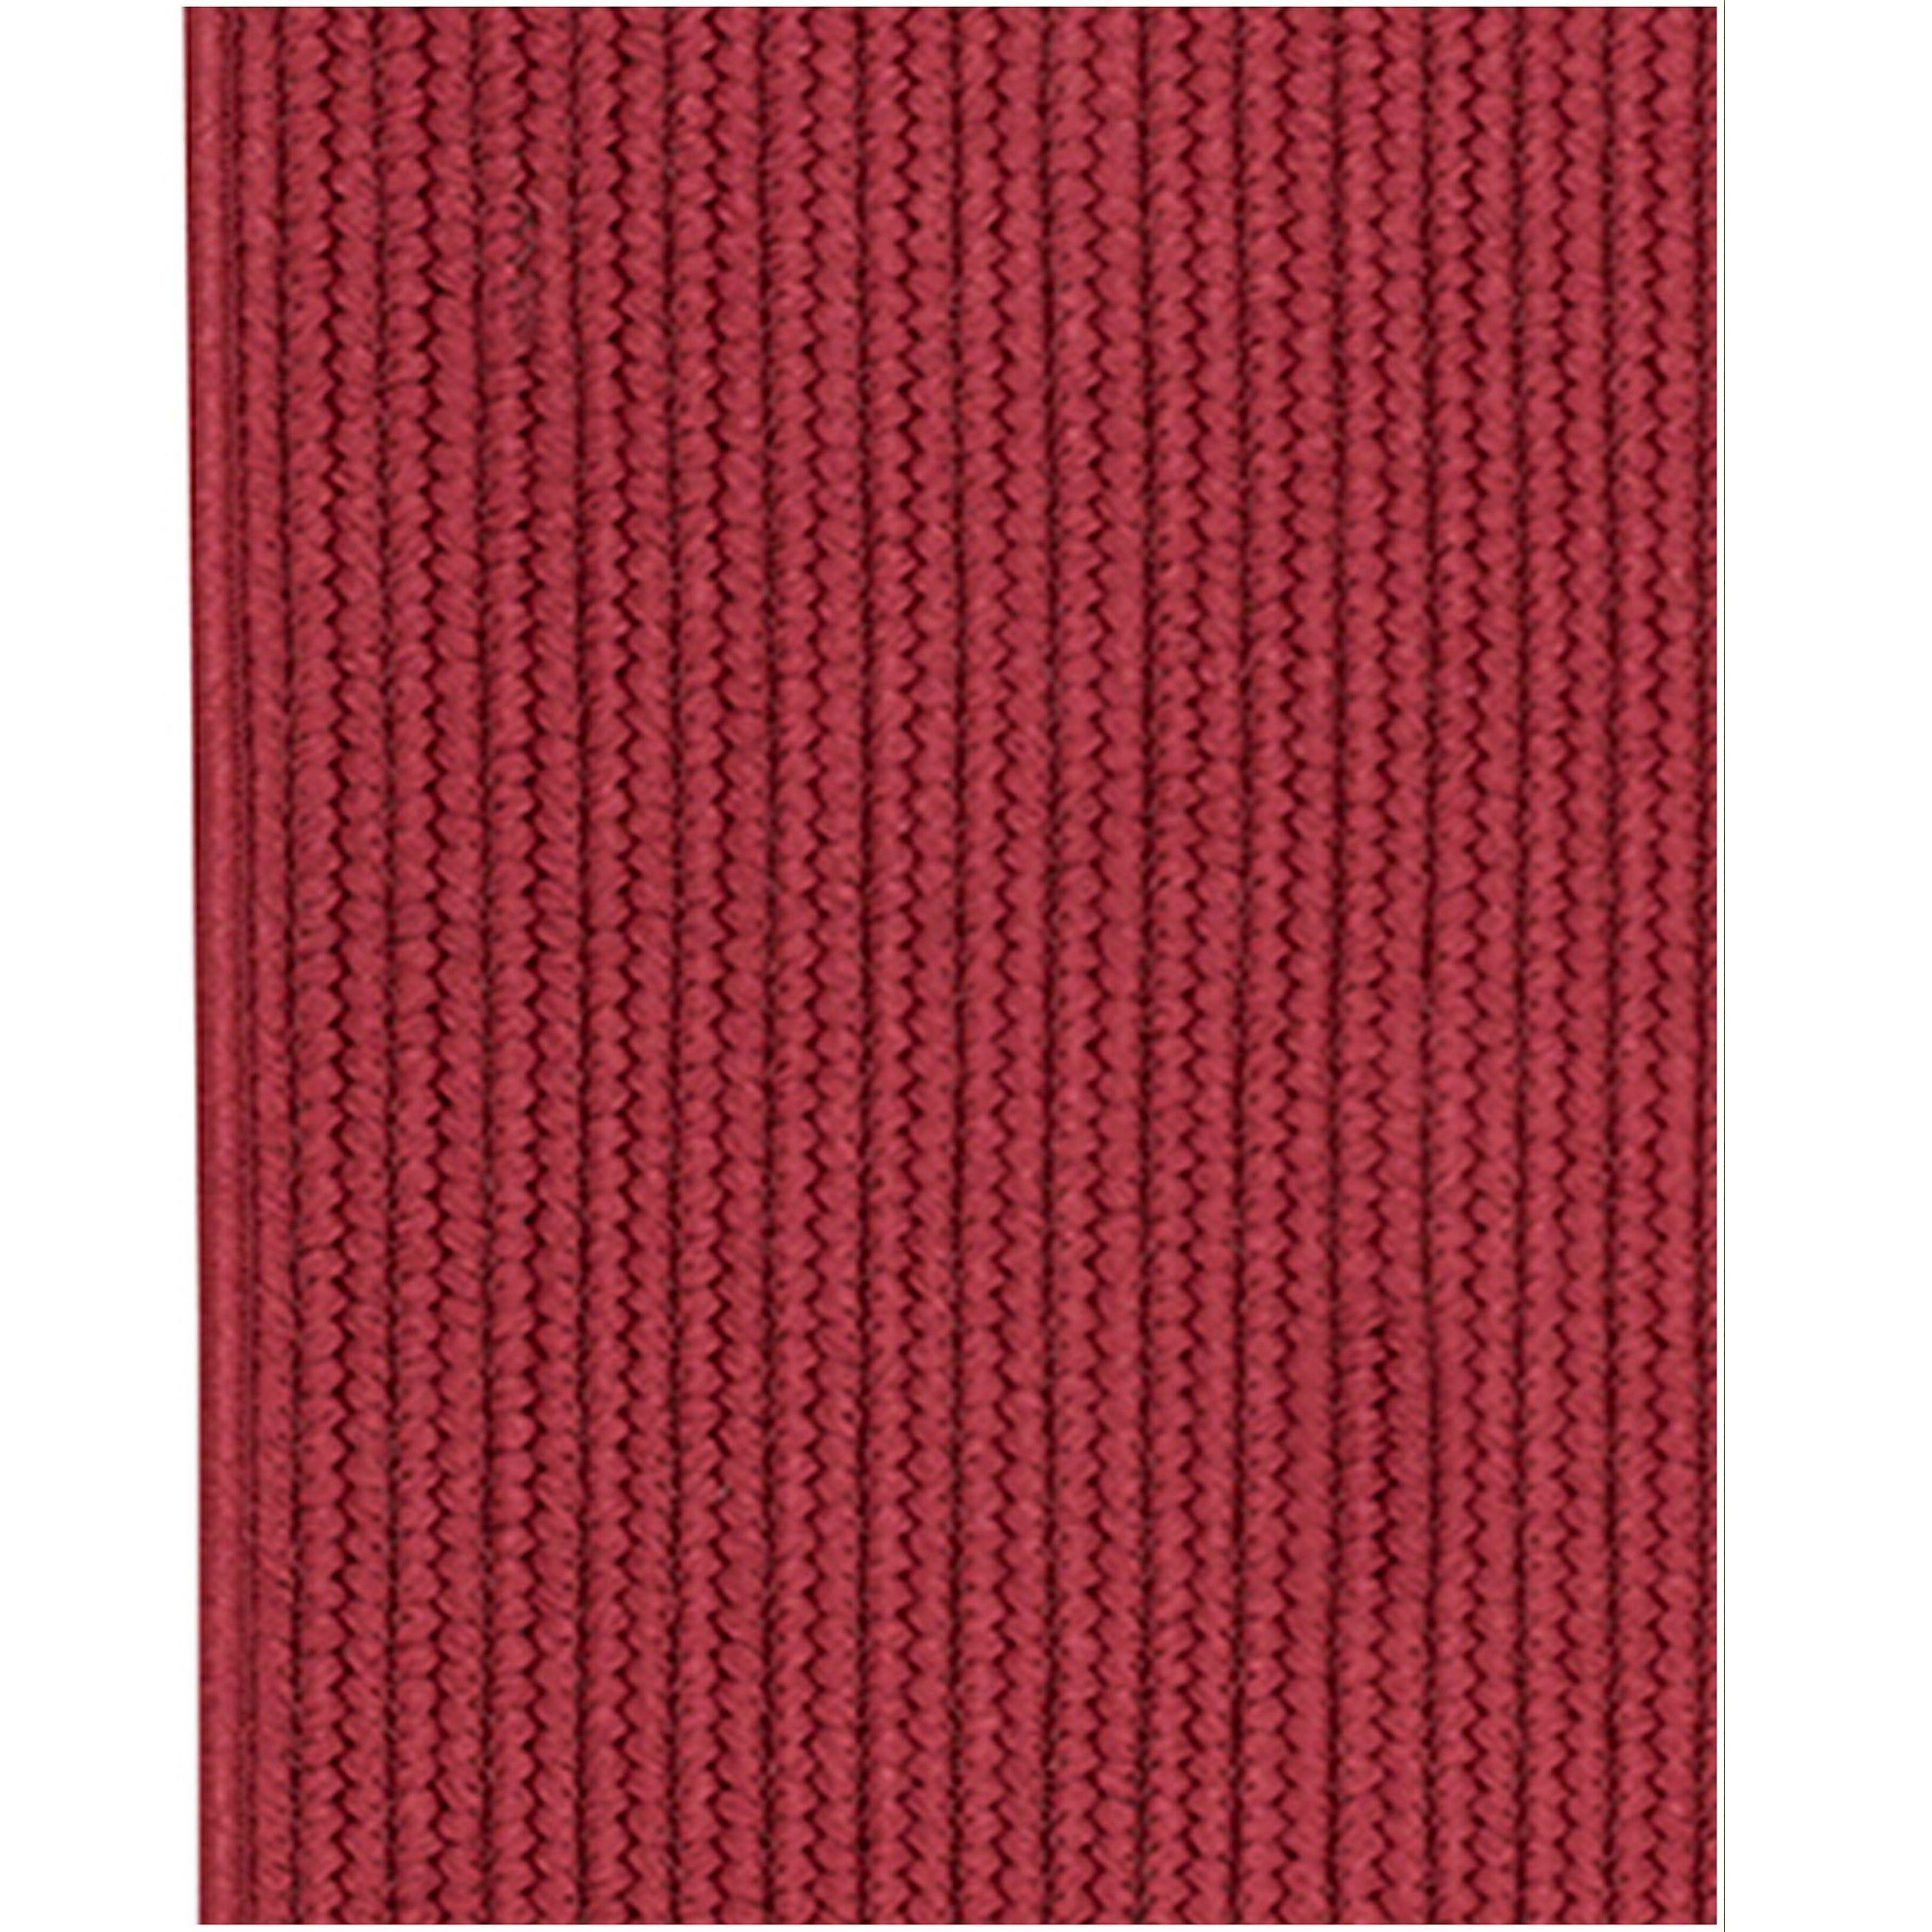 2 X 6 Brick Red All Purpose Rectangular Mudroom Rug Runner In 2020 Rug Runner Rugs Red